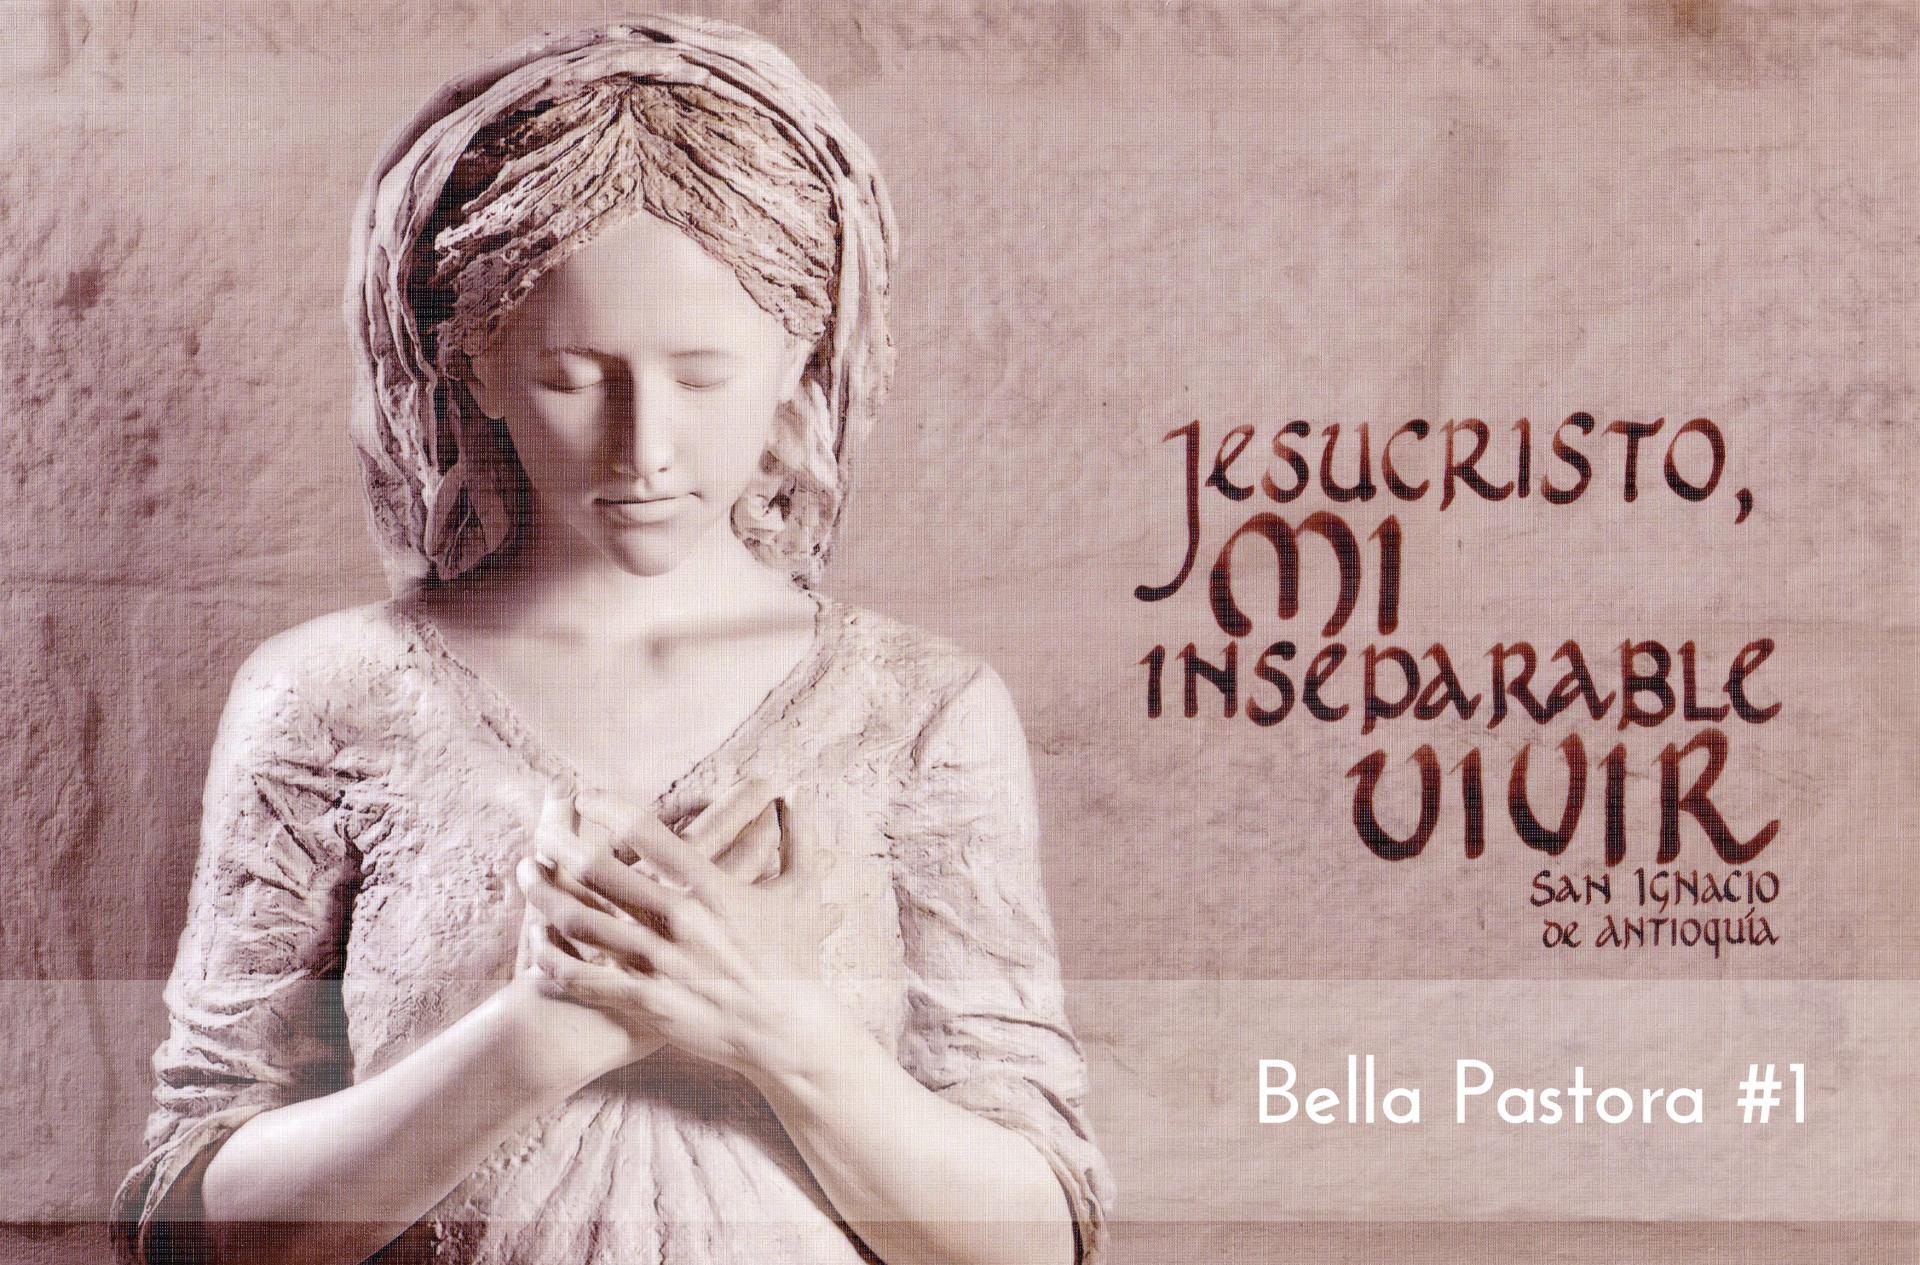 Bella Pastora #1 Foam